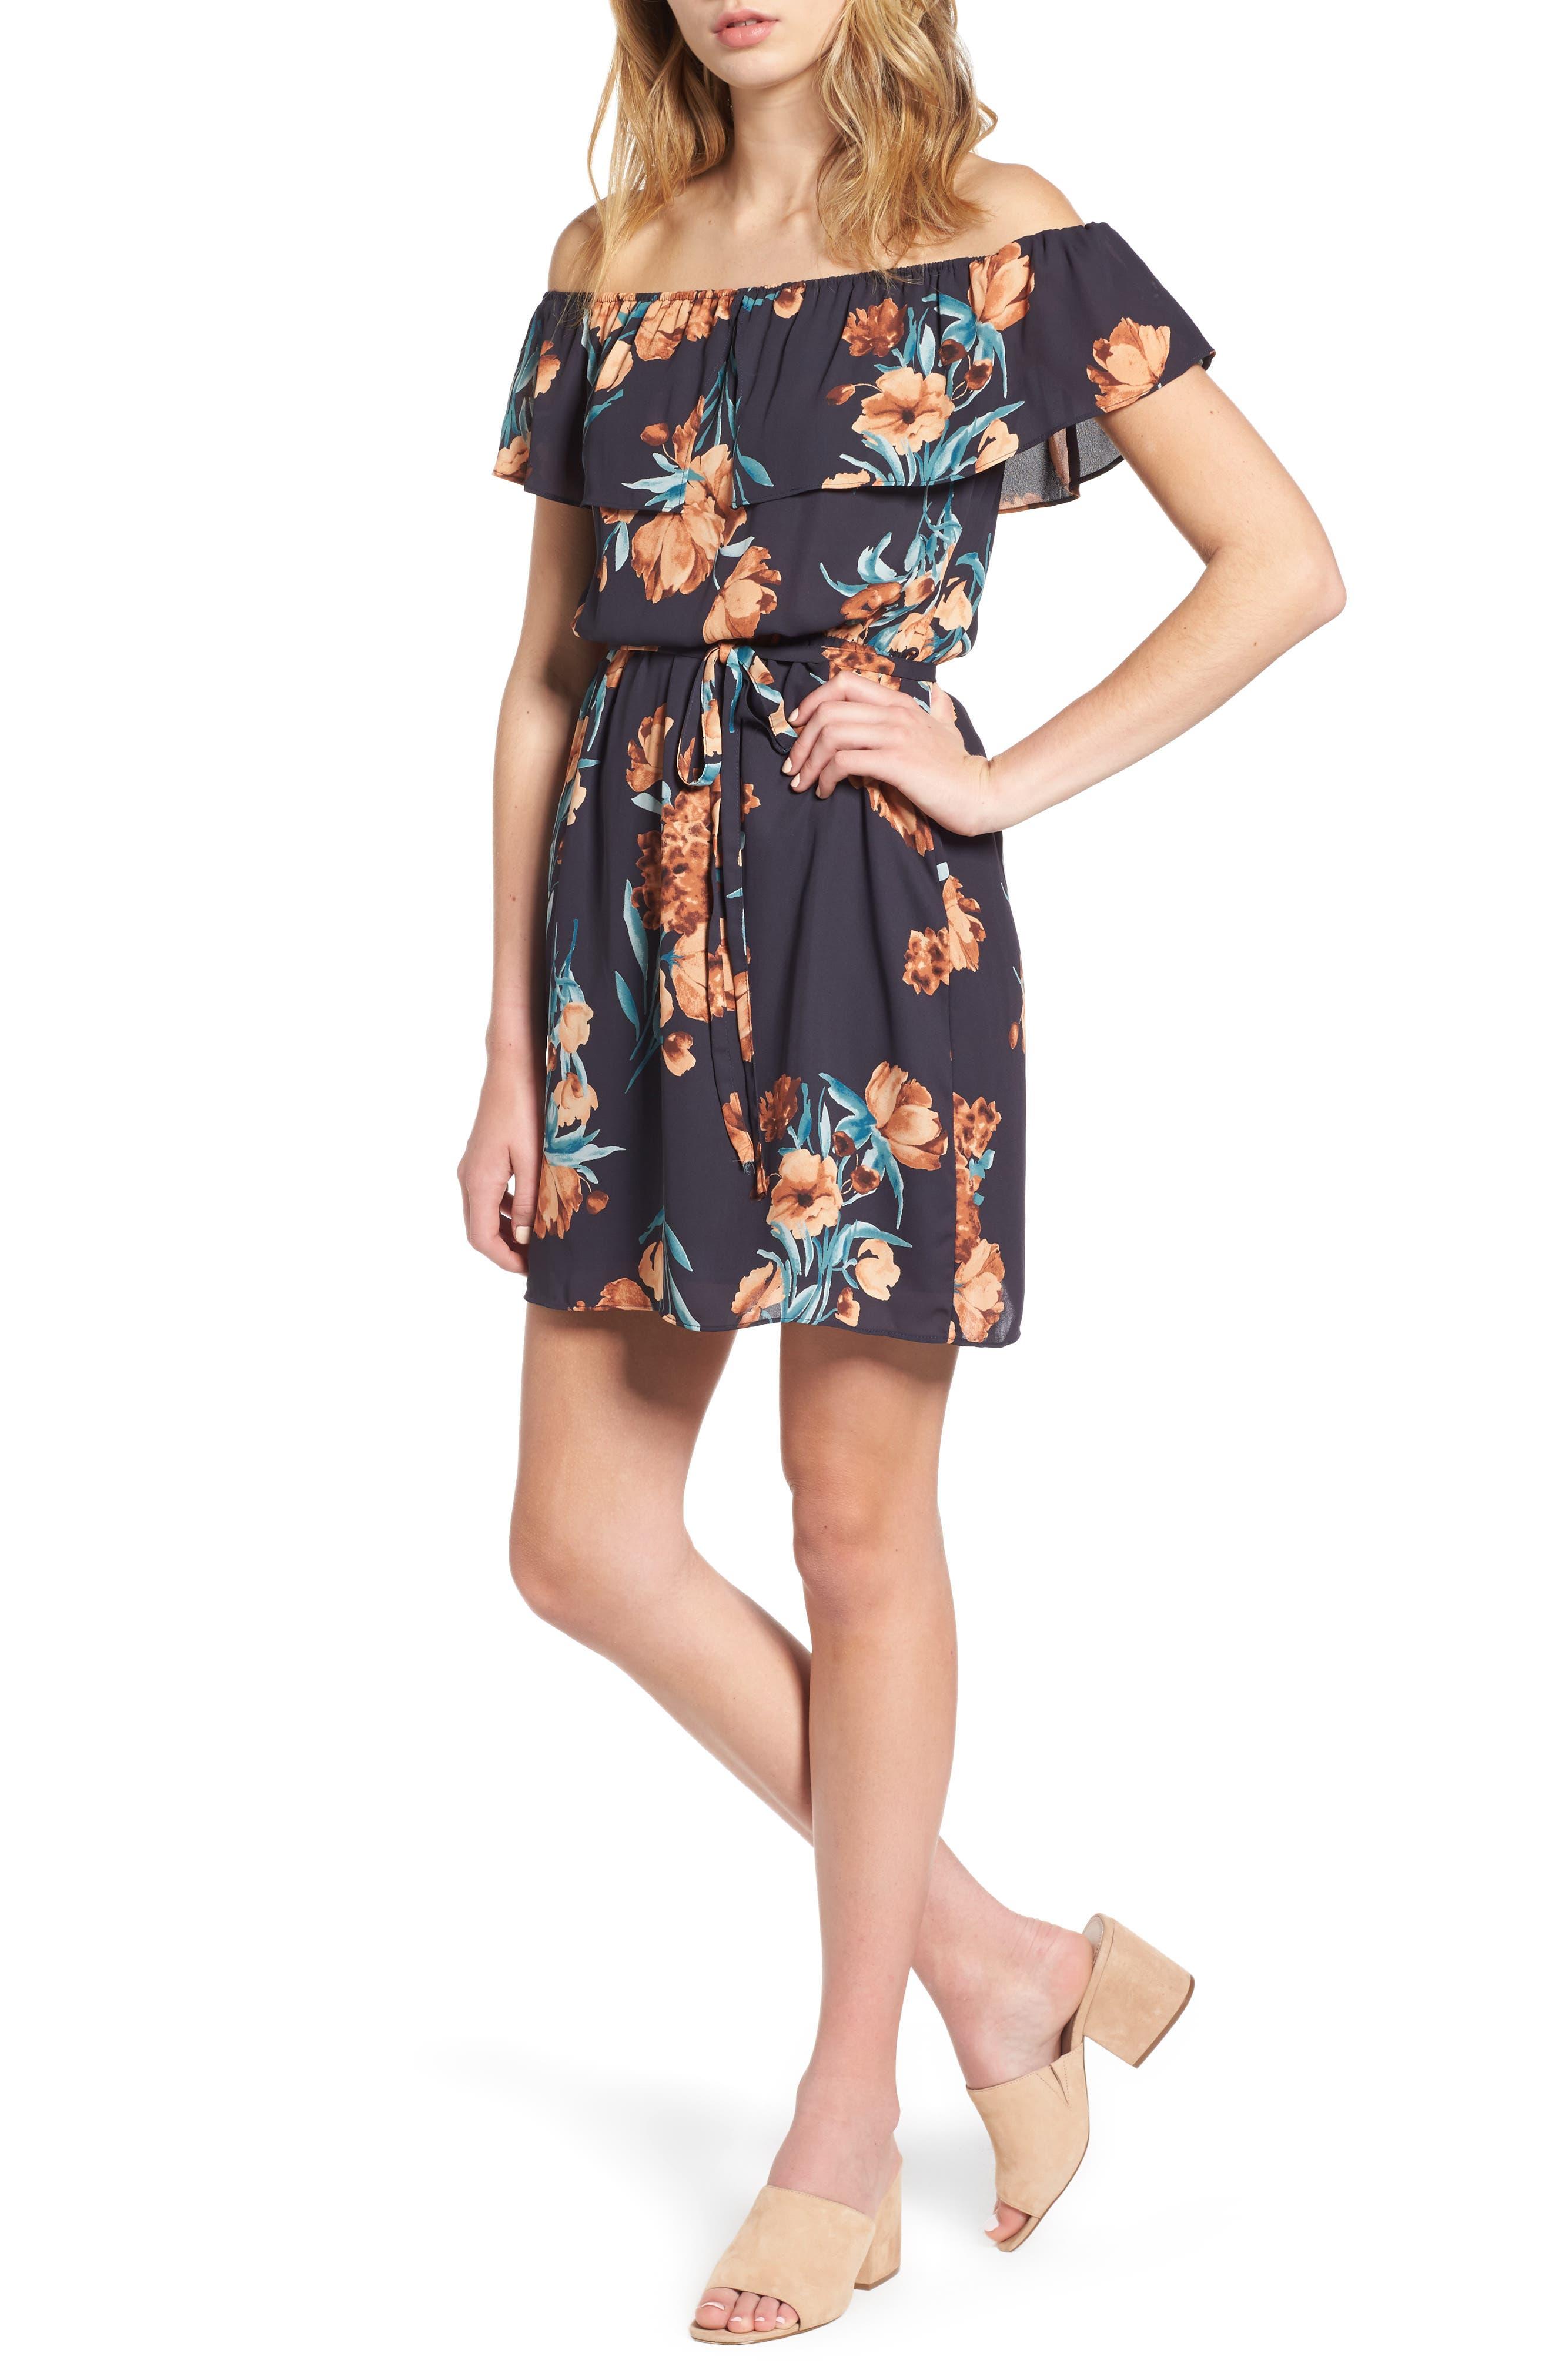 EVERLY Floral Off the Shoulder Dress